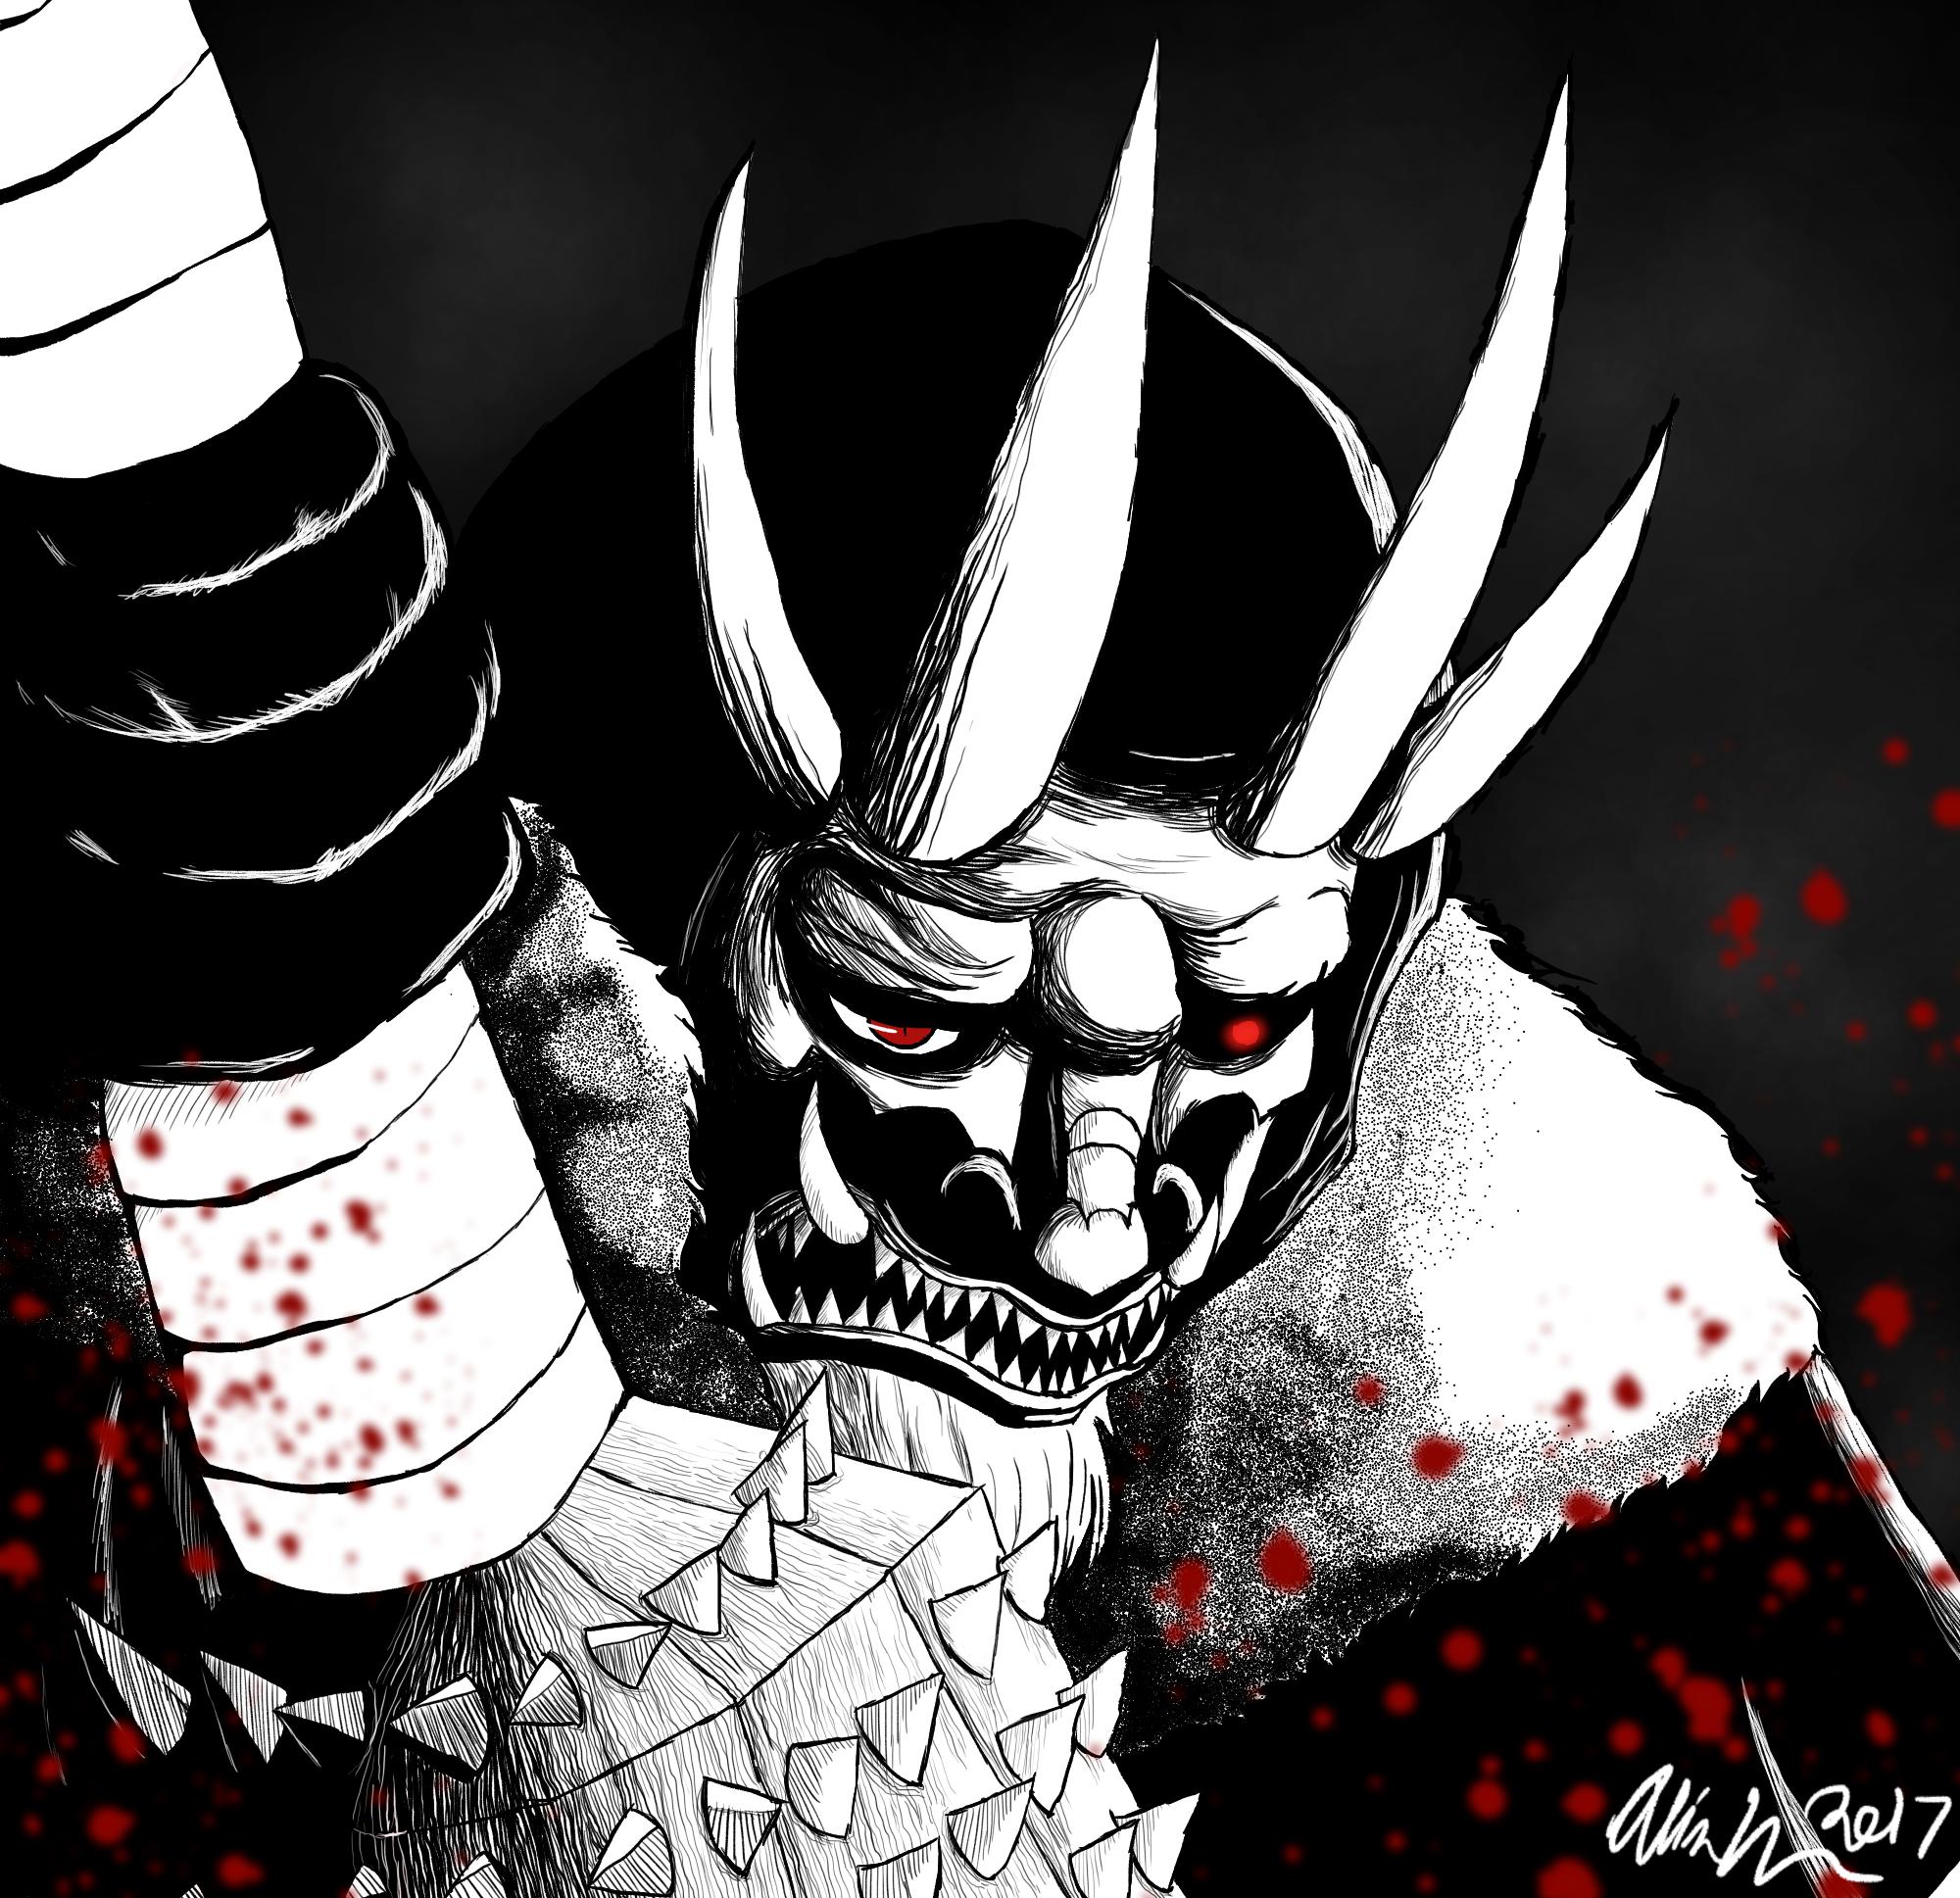 Wrath: The Demon Sin by artisticallystrange